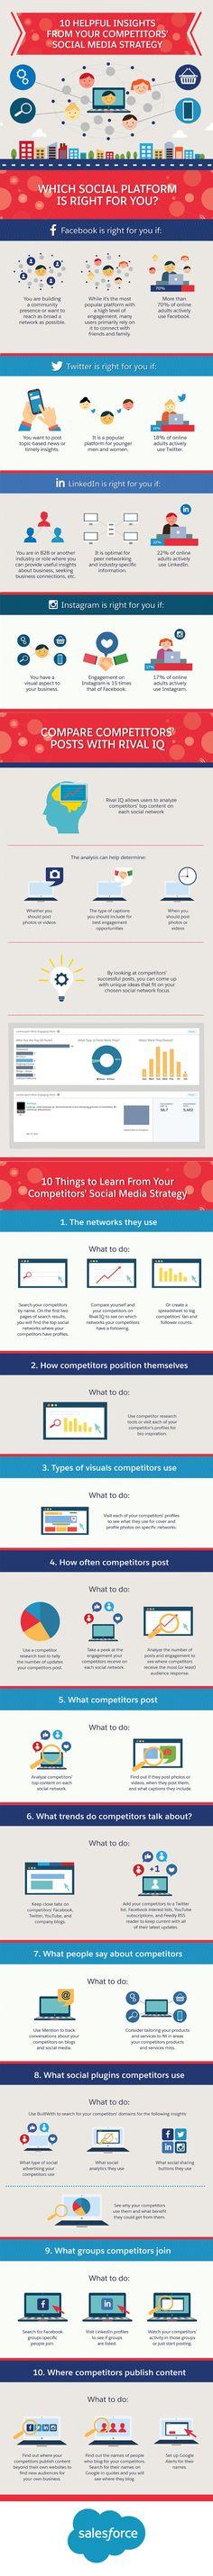 Infographie 218 - 10 tips social media